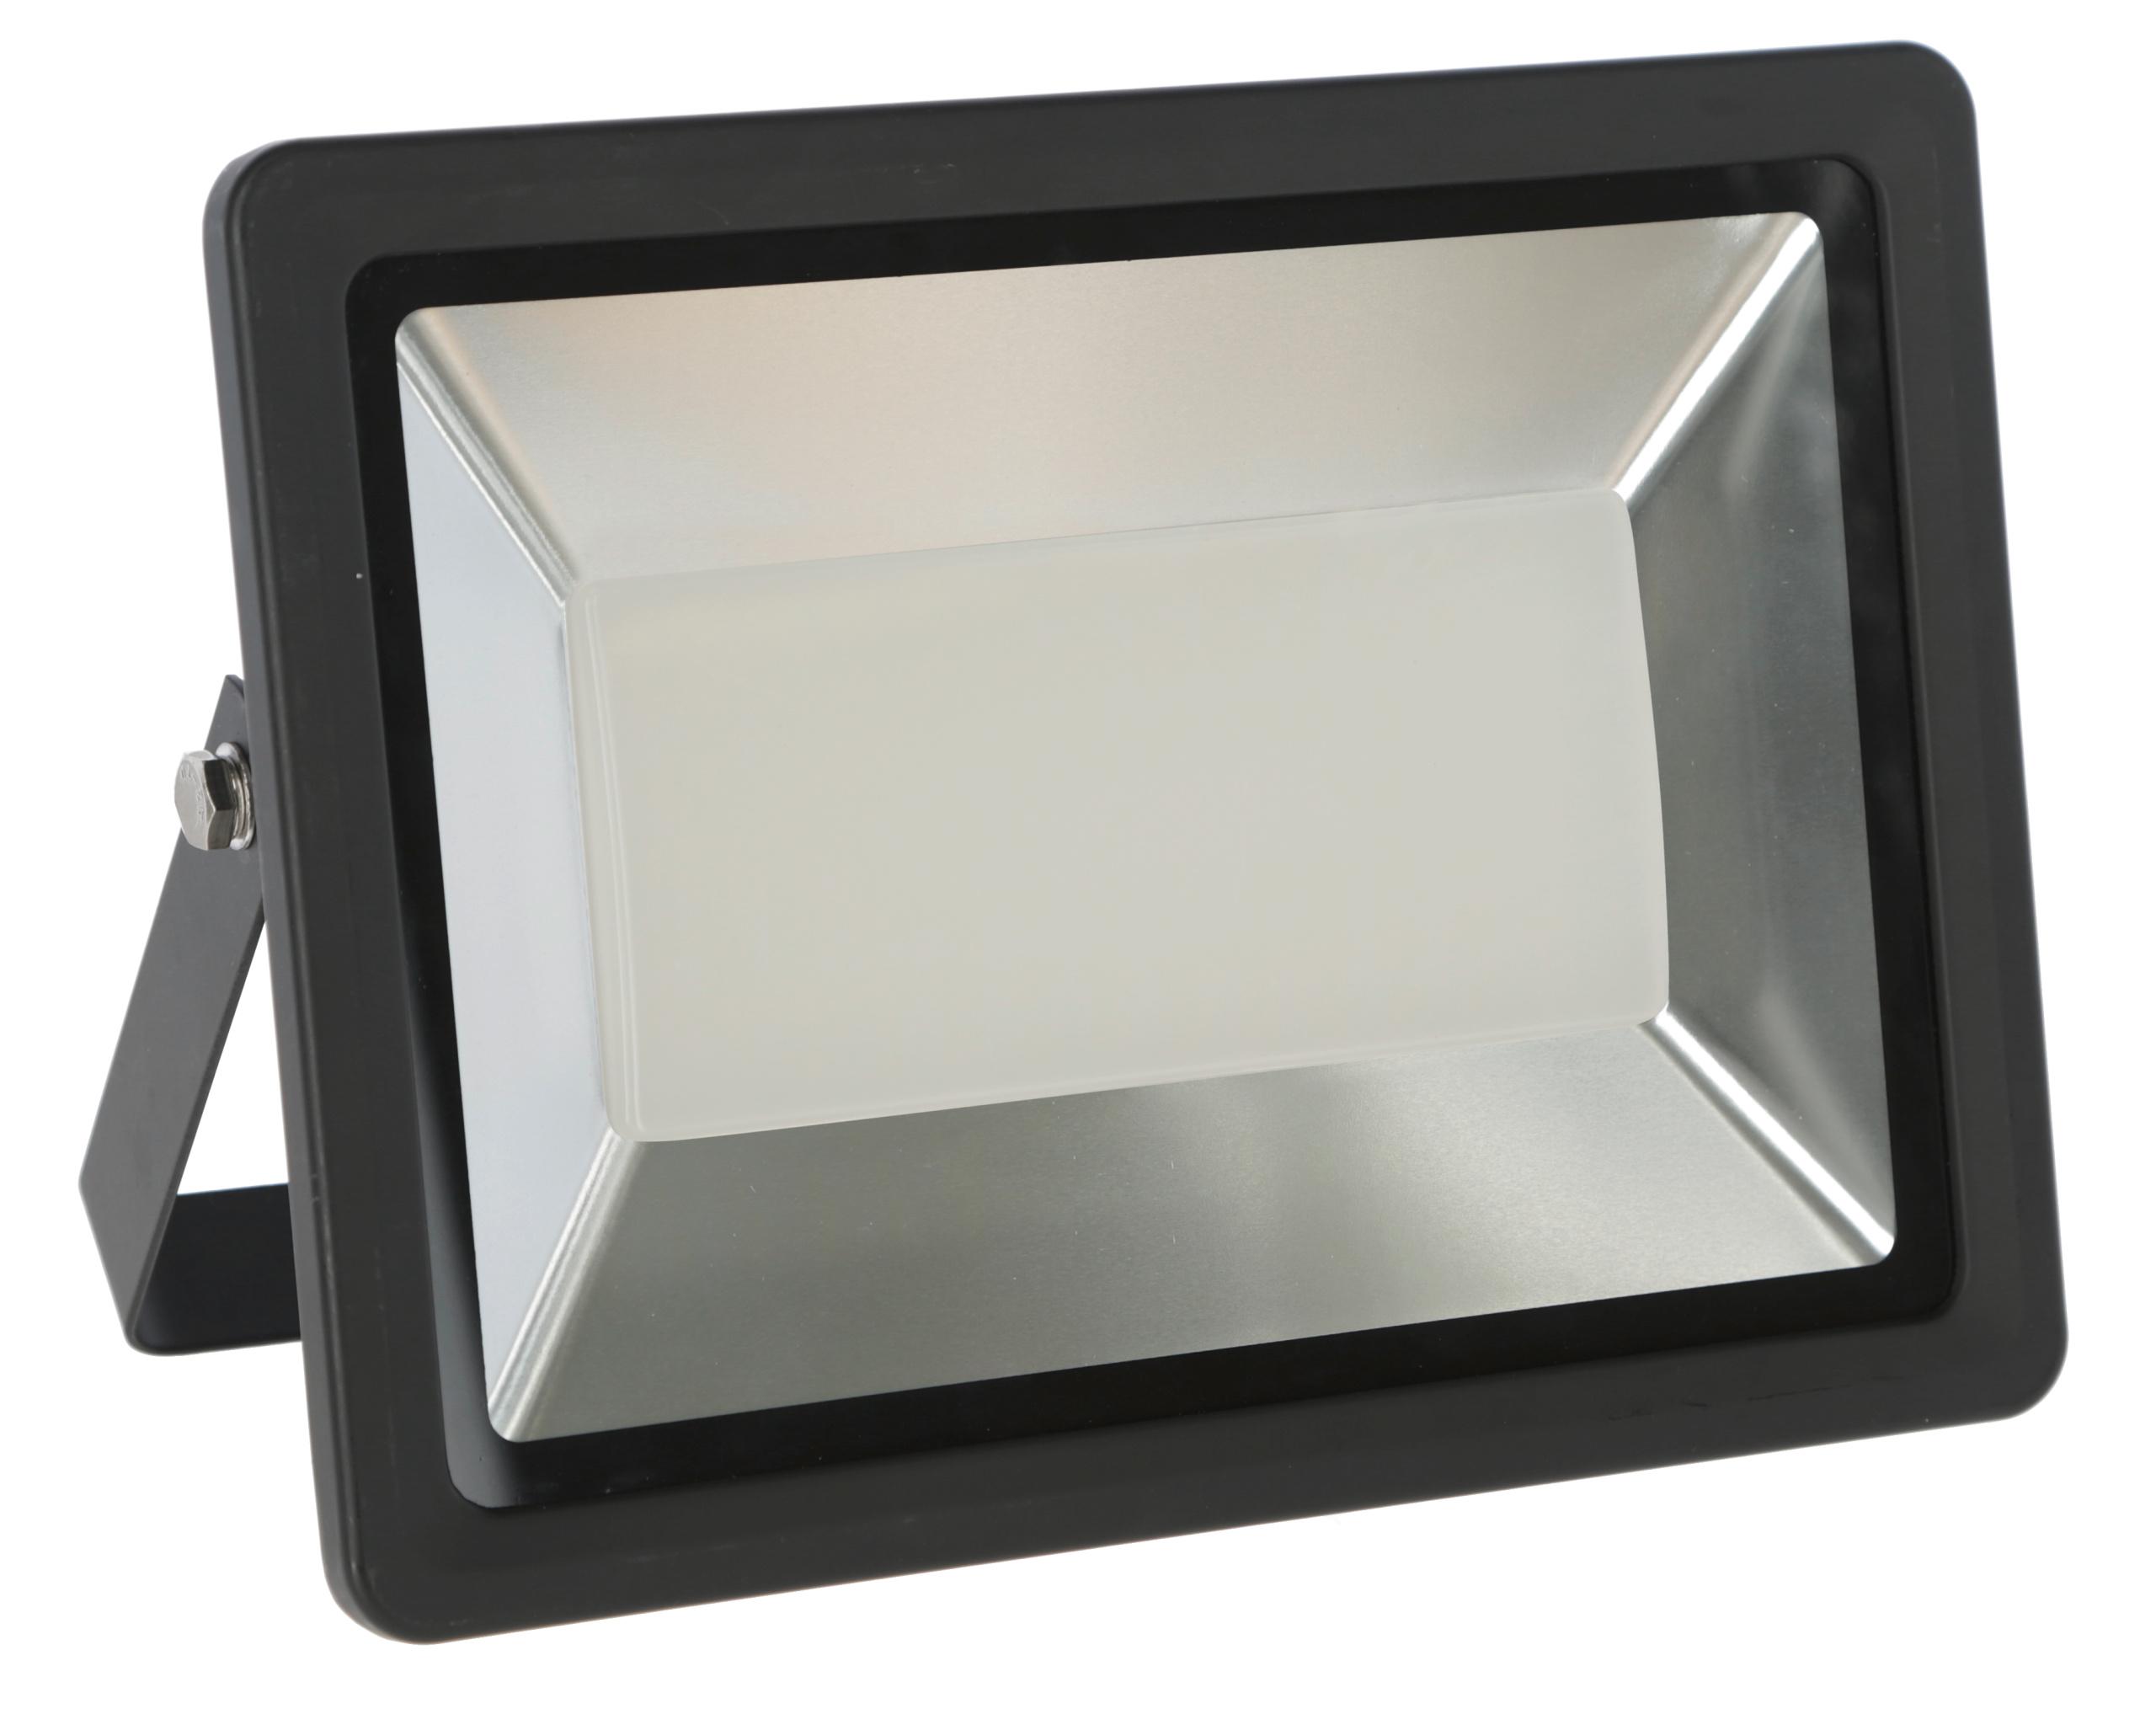 LED Außenstrahler 100W. Mod. 2020